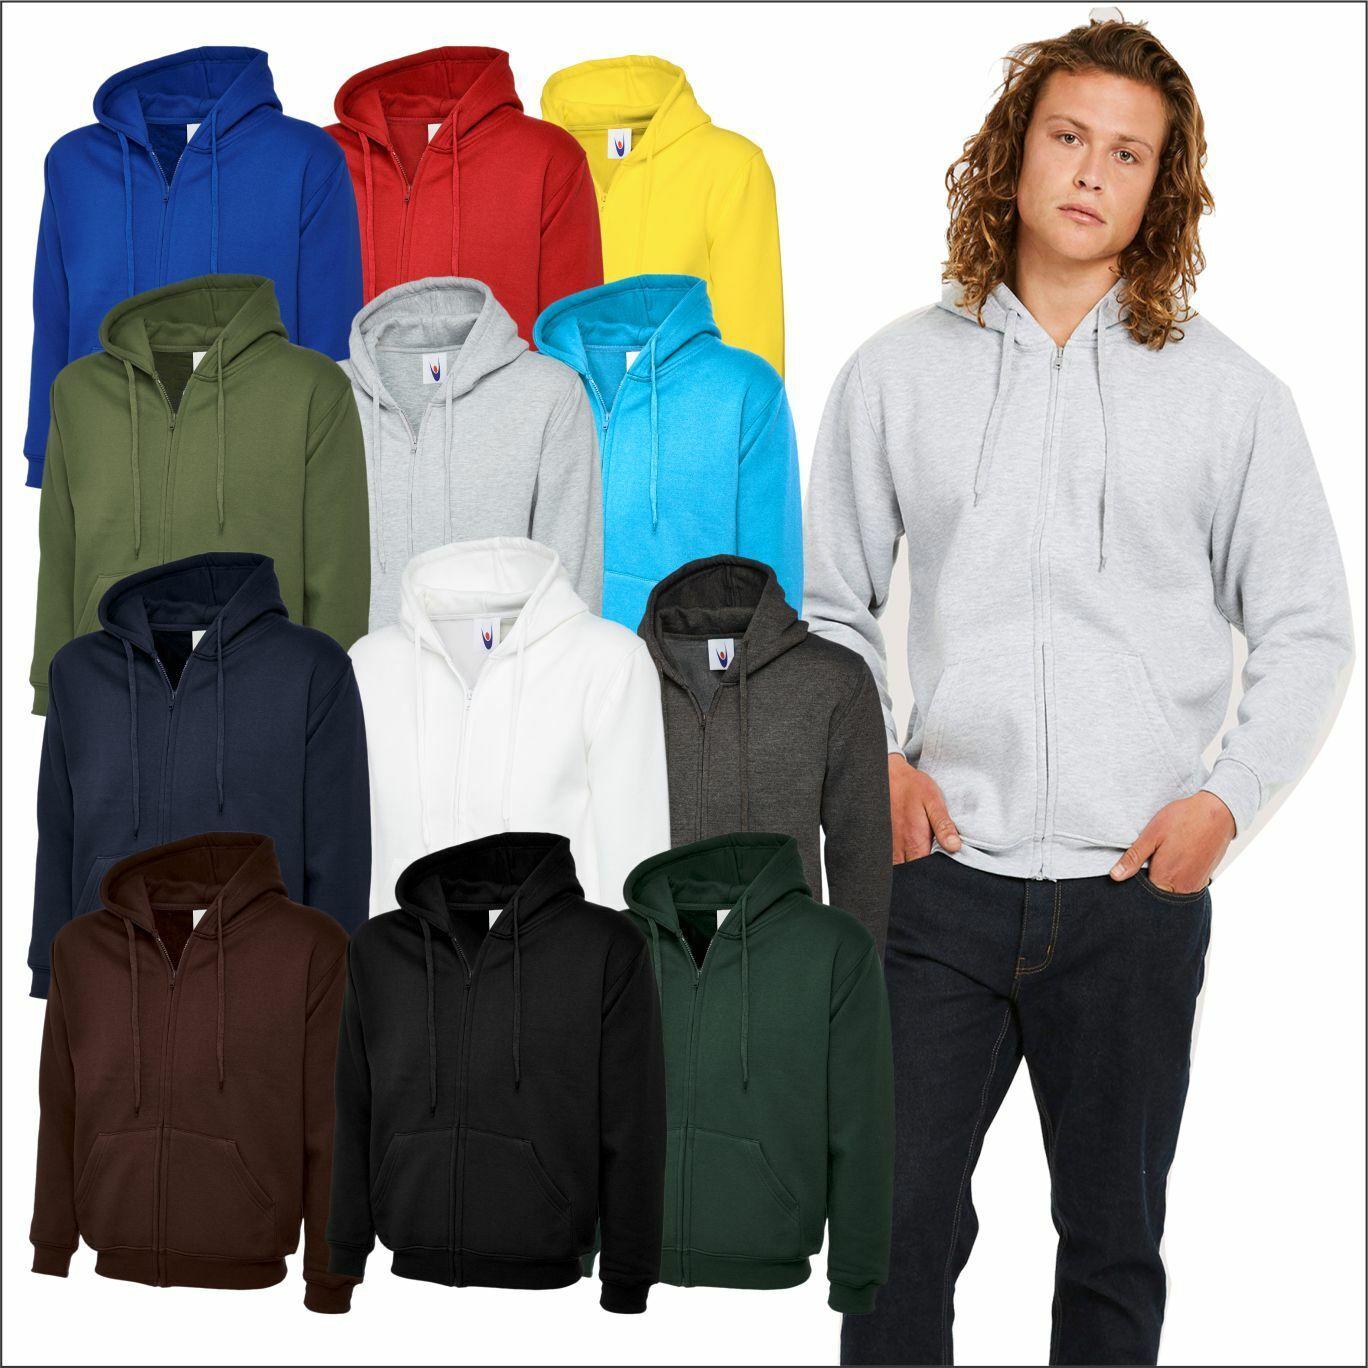 Adults Classic Full Zip Hooded Sweatshirt Unisex Workwear Pullover Zipped Jumper